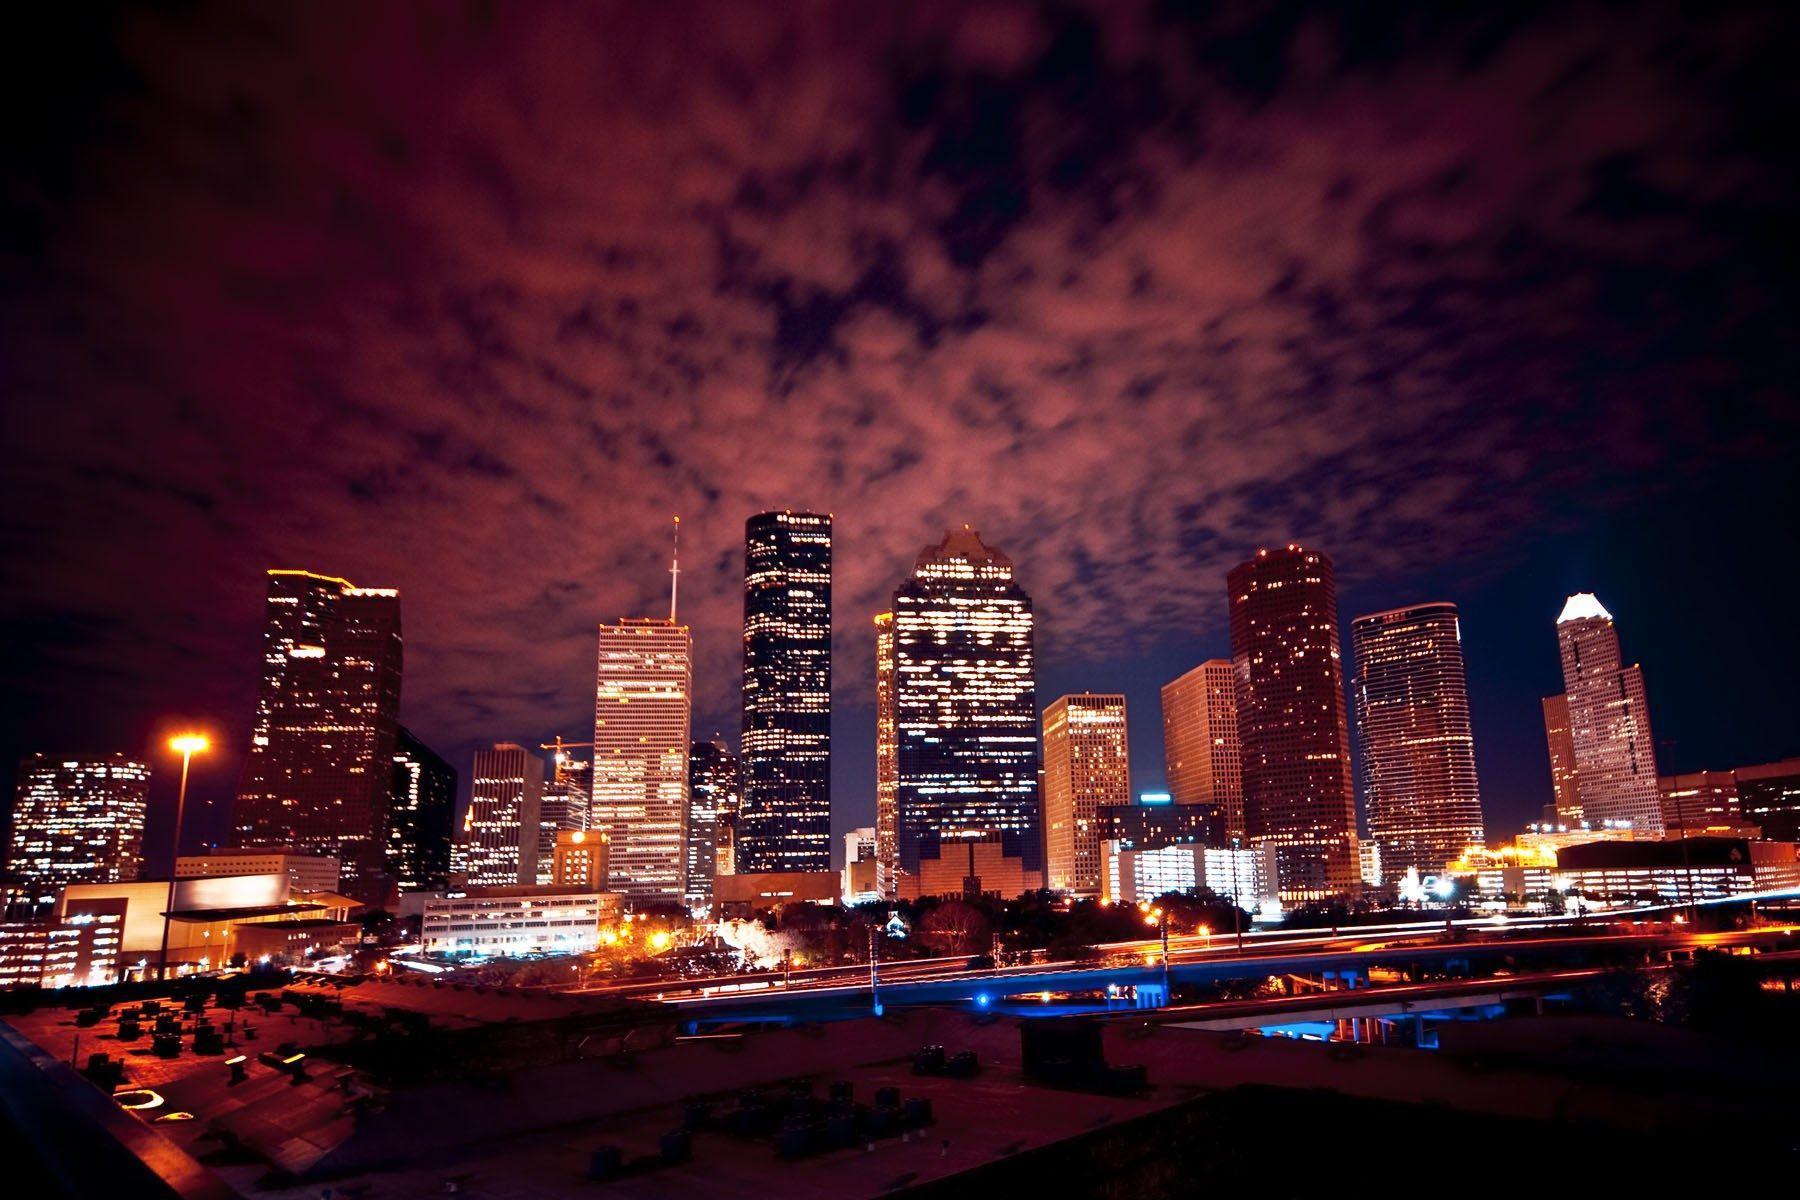 Night Houston Skyline Wallpaper